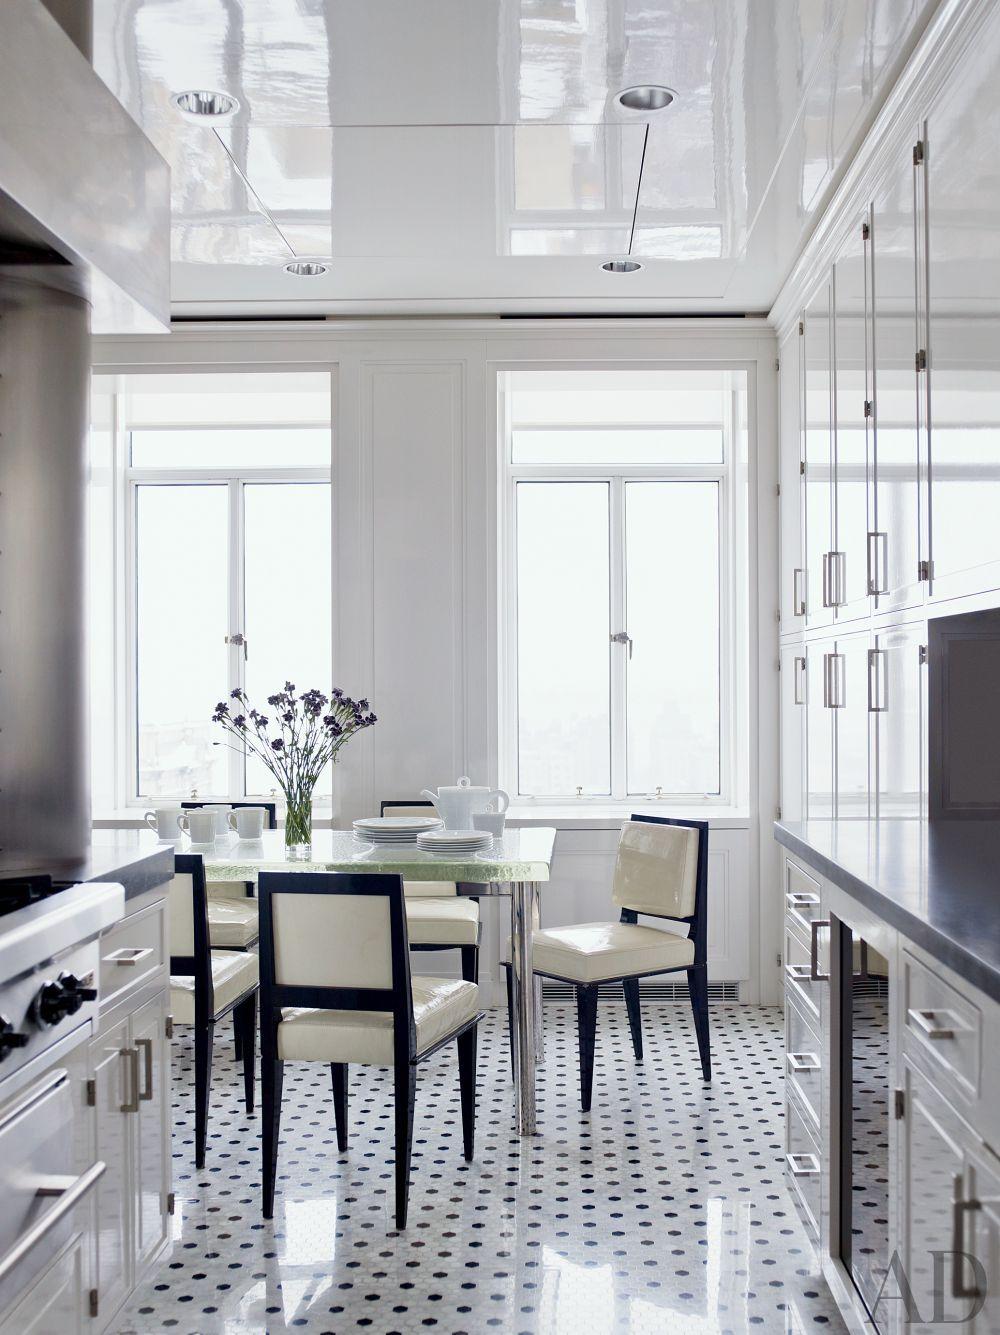 mutfakta-asma-tavan-modelleri-15